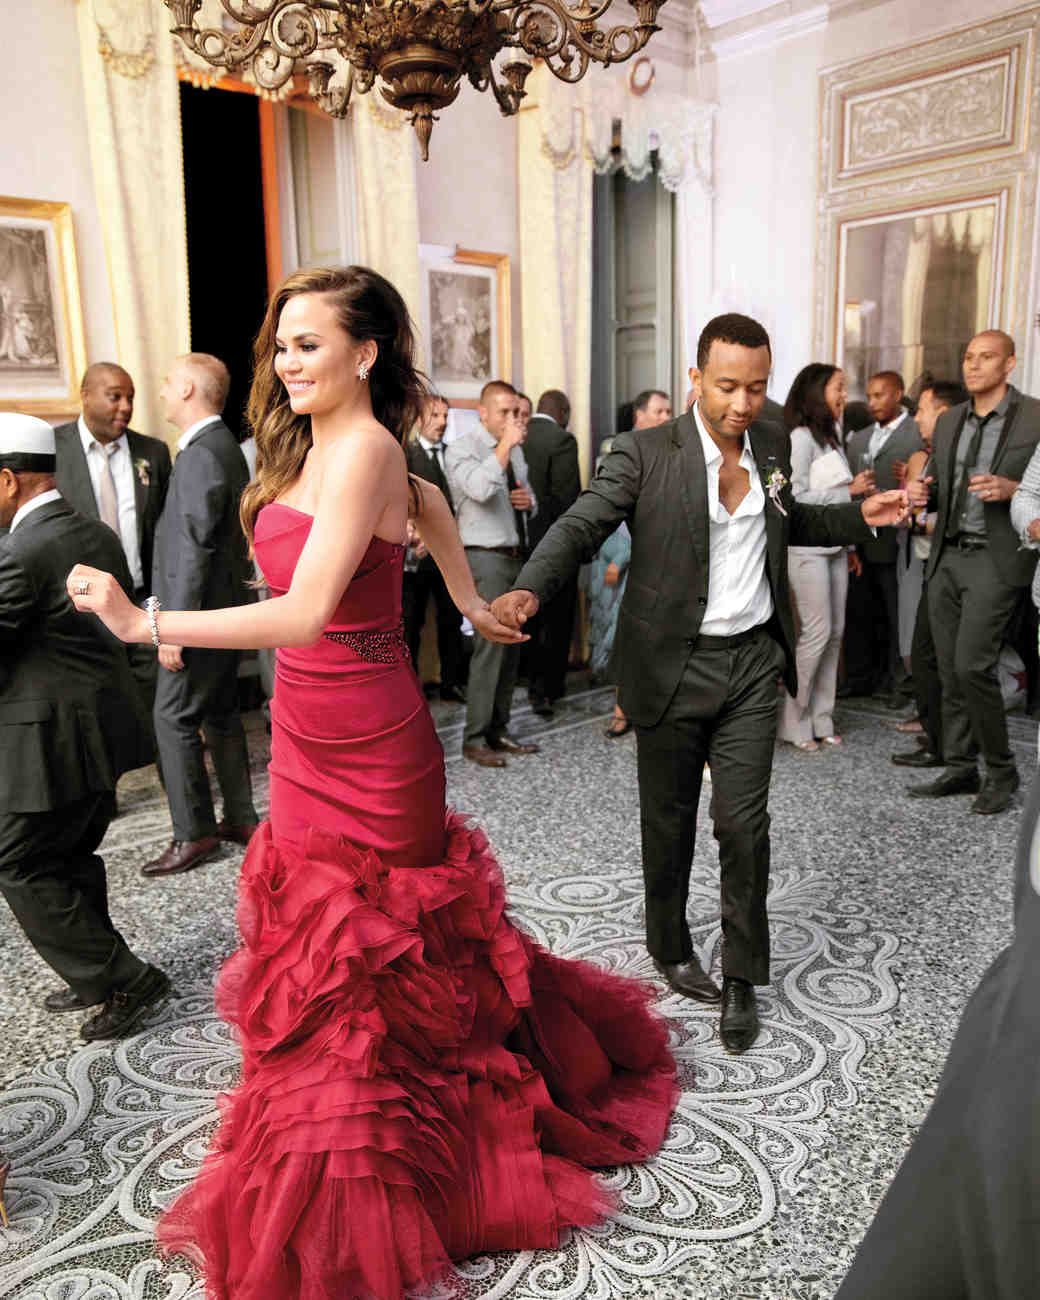 red wedding dresses red wedding dress Chrissy Teigen s Red Wedding Dress